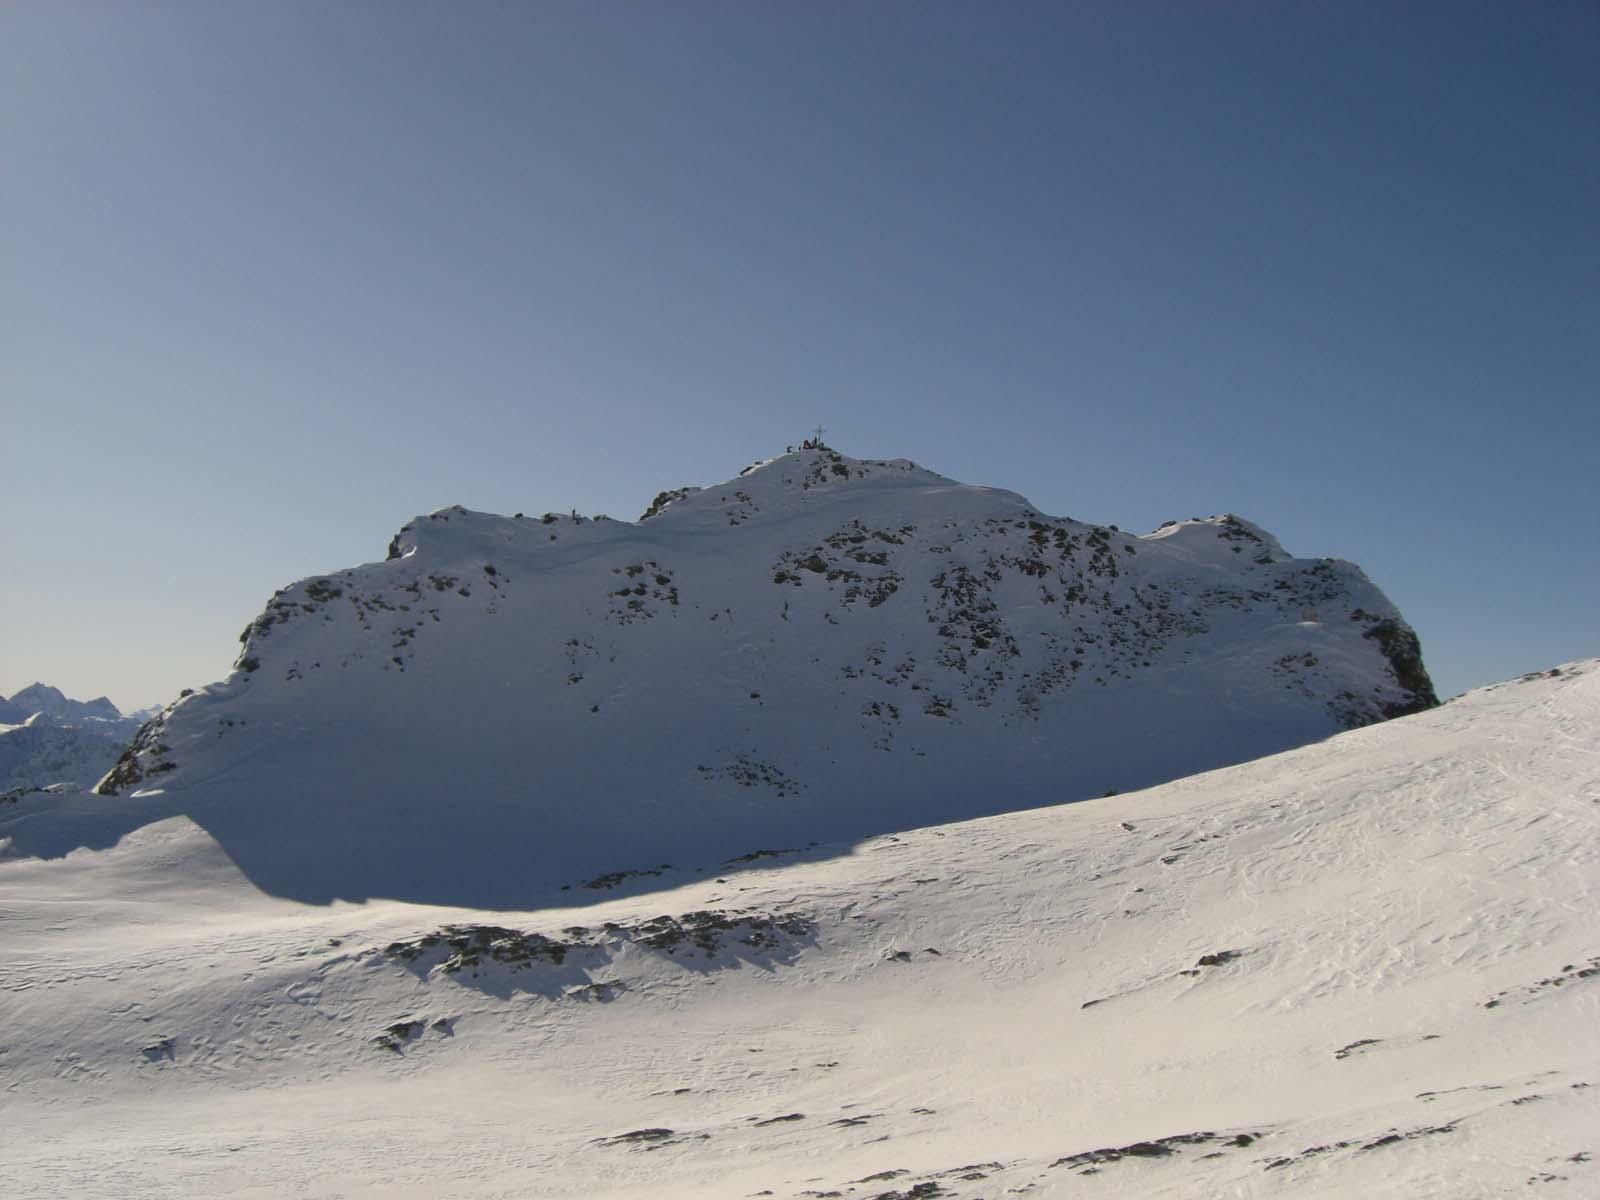 Foto: Thomas Paschinger / Skitour / Zwieselsbacher Roßkogel, 3081m / Gipfelaufbau des Zwieselsbacher Roßkogels / 07.02.2009 13:37:14